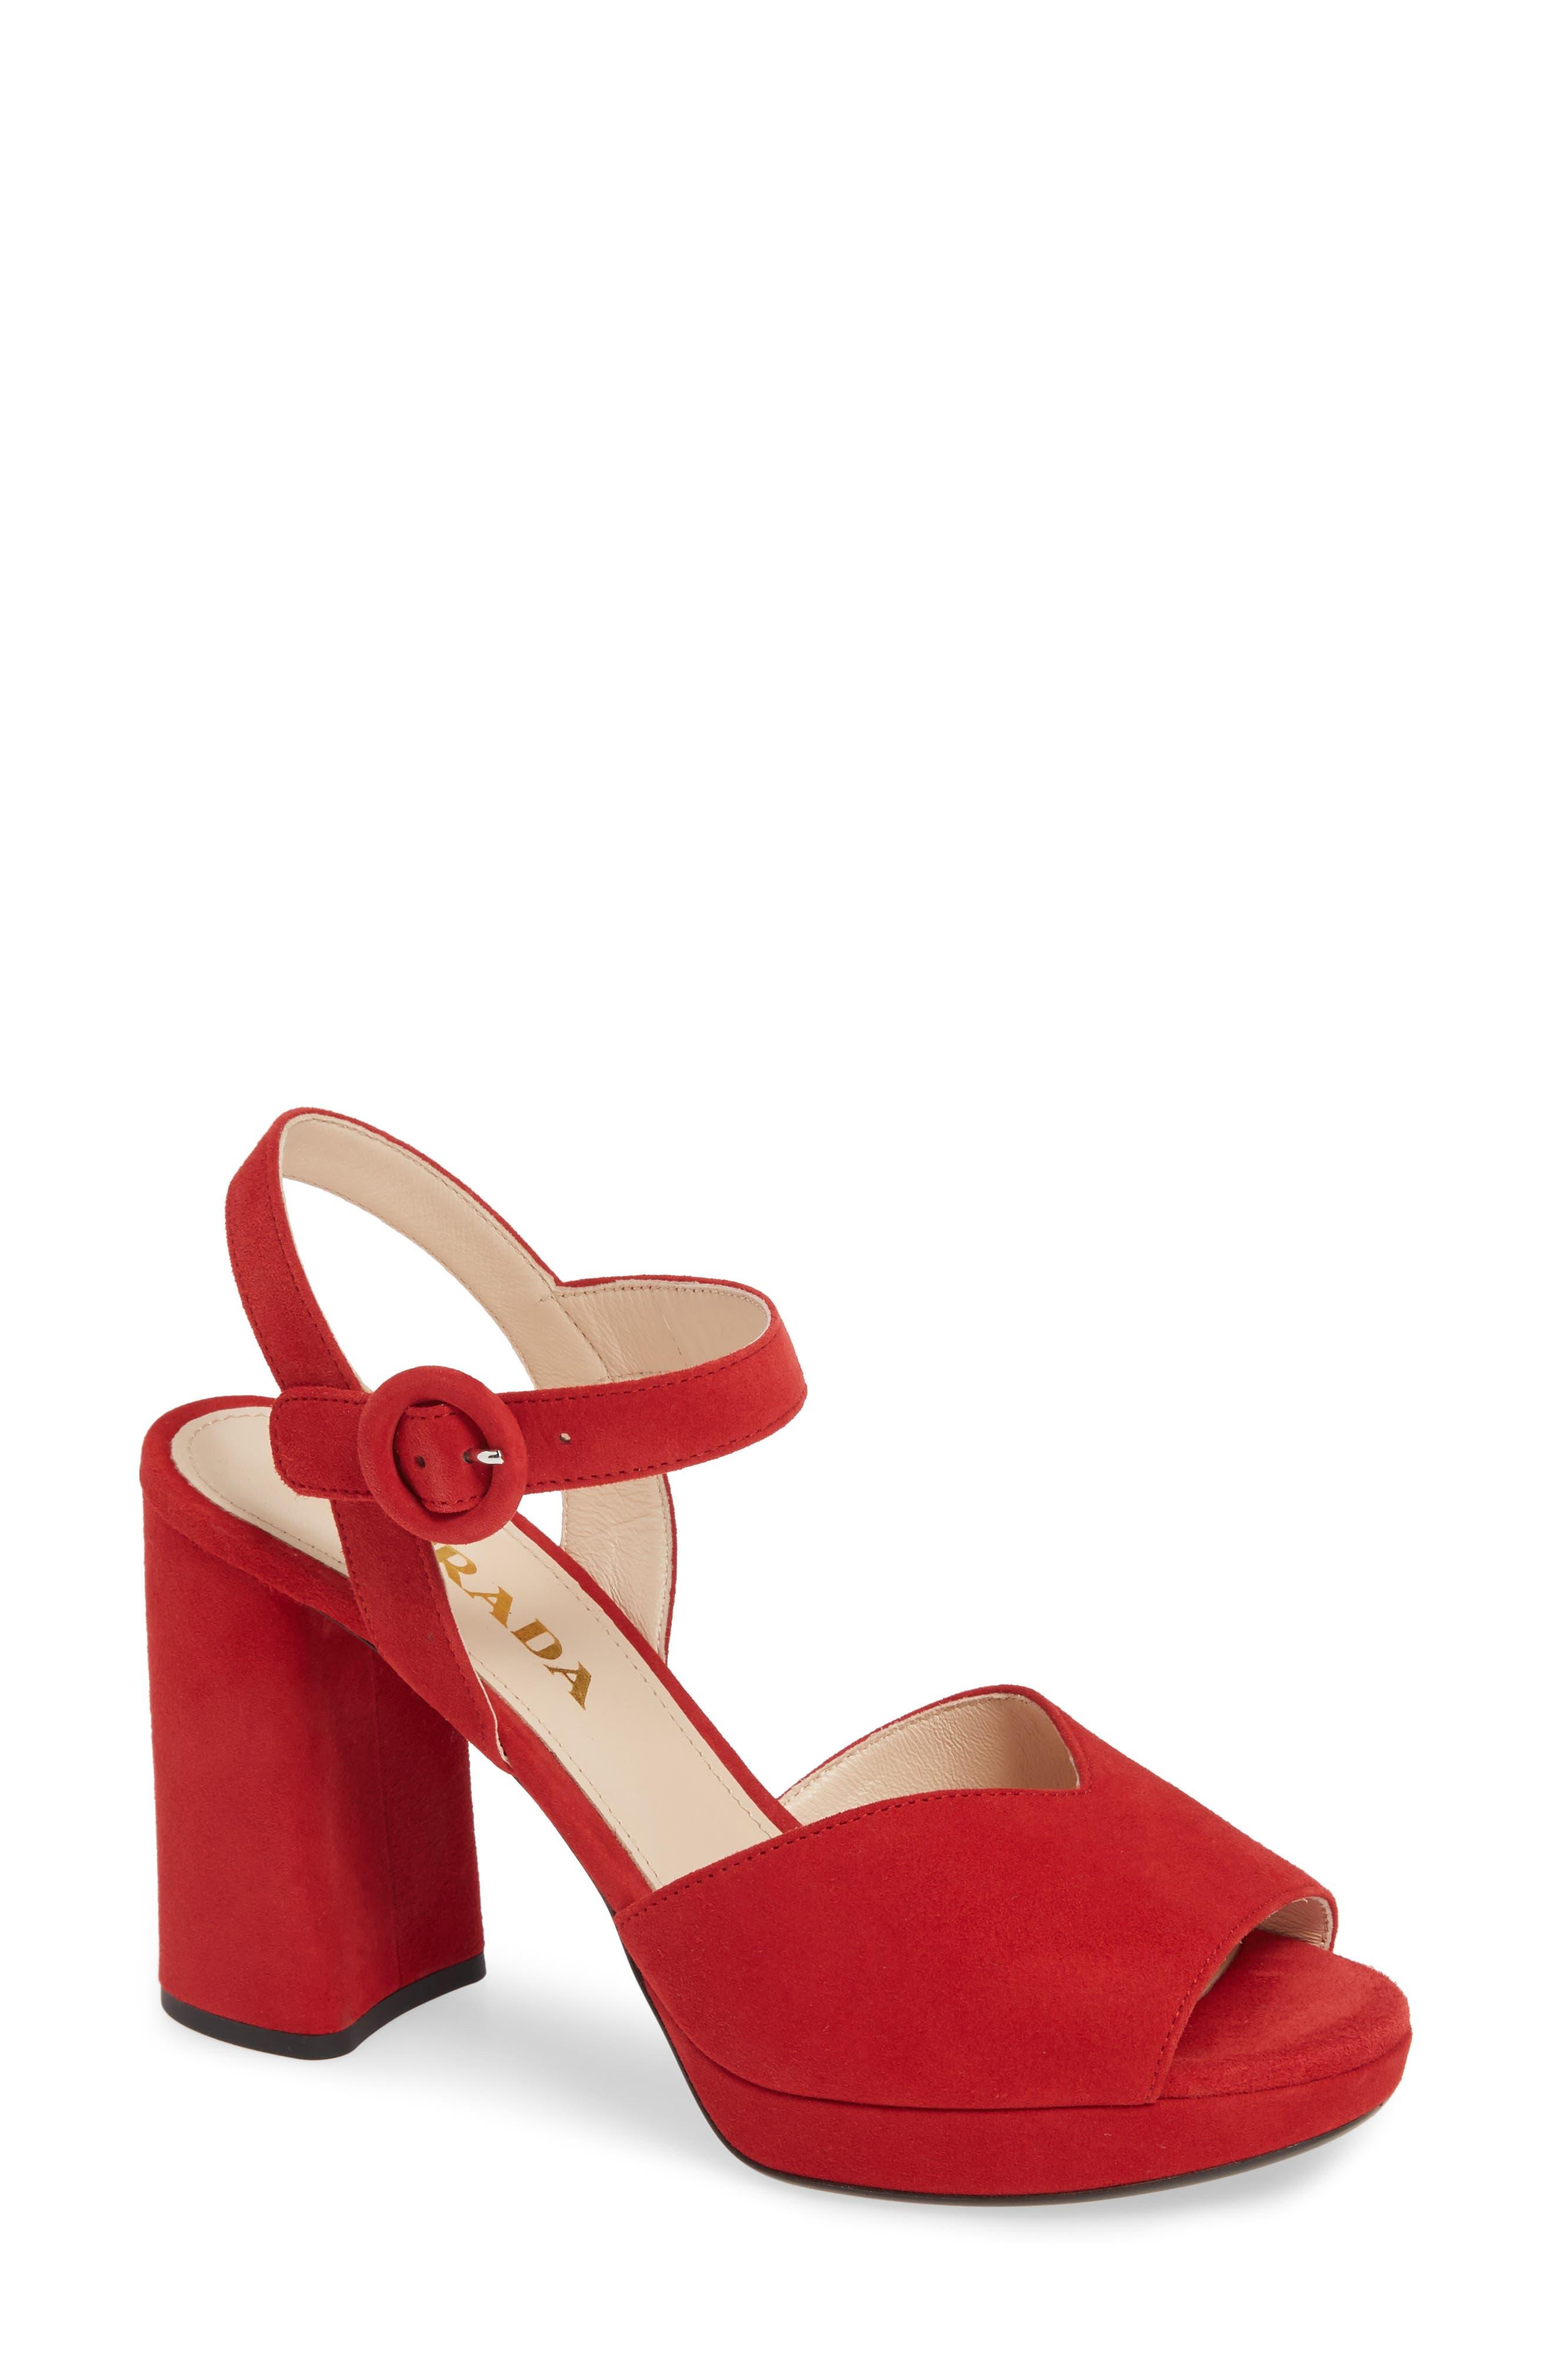 PRADA, Platform Sandal, Main thumbnail 1, color, RED SUEDE